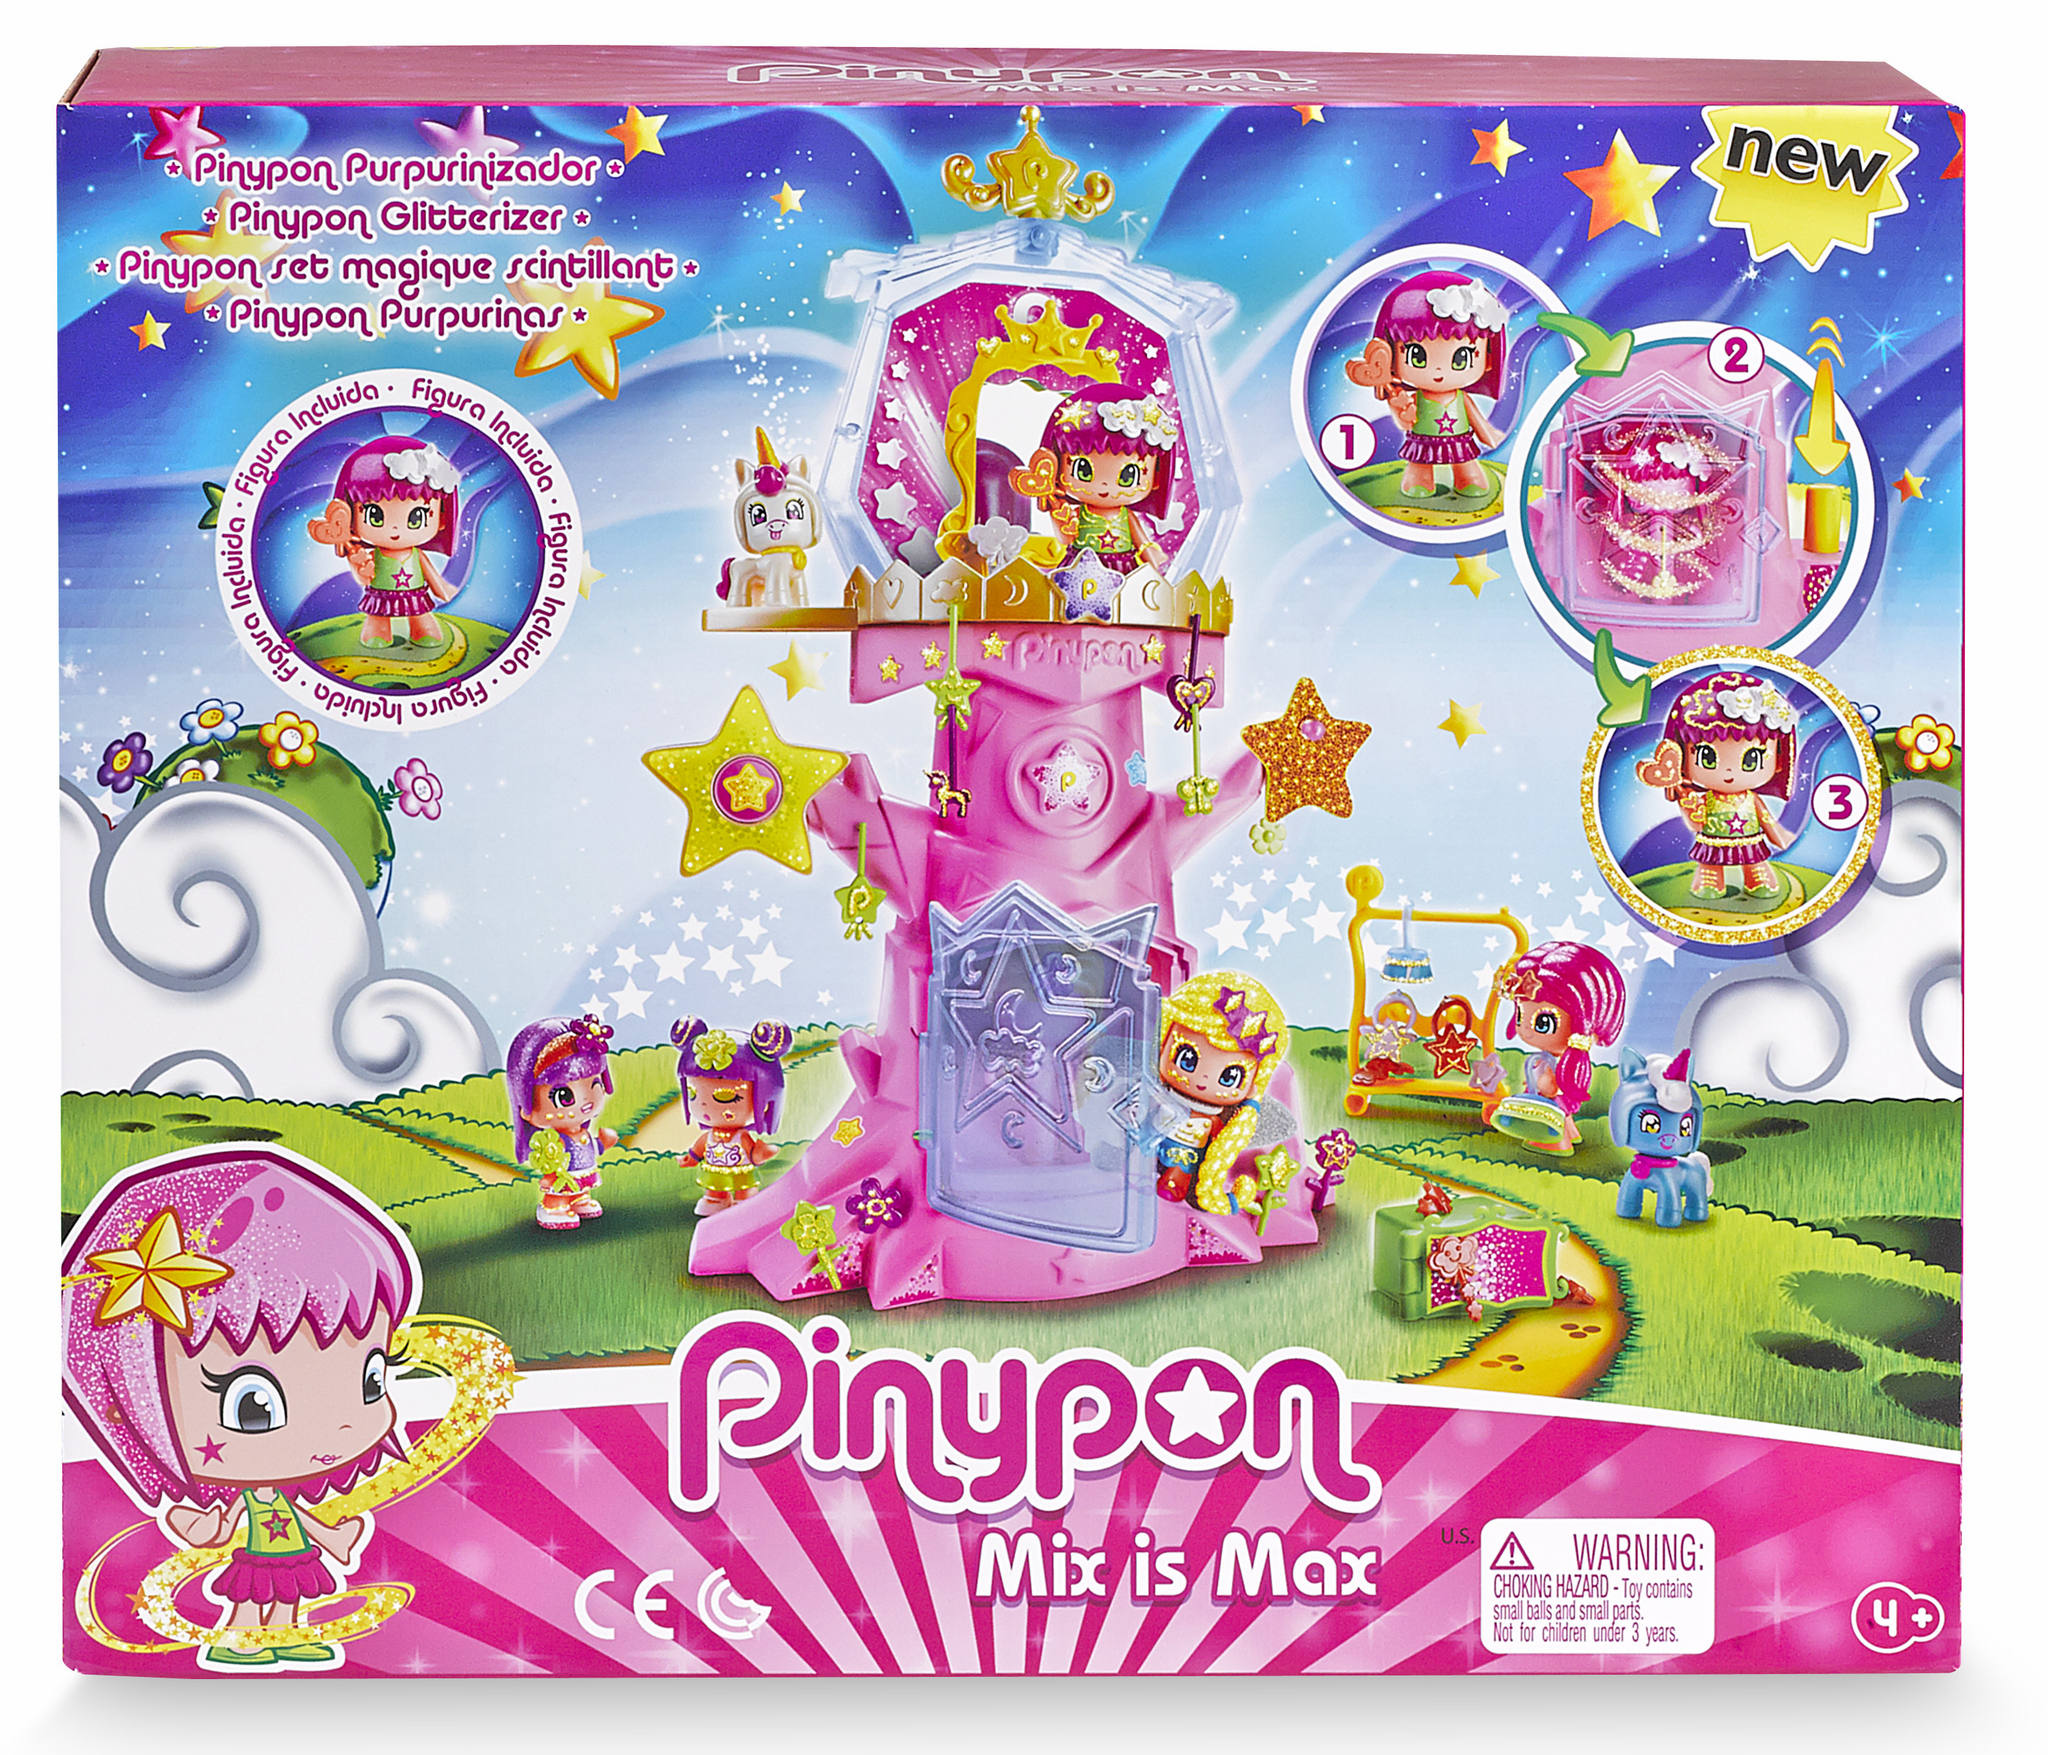 PINYPON PURPURINIZADOR 14264 - N8719